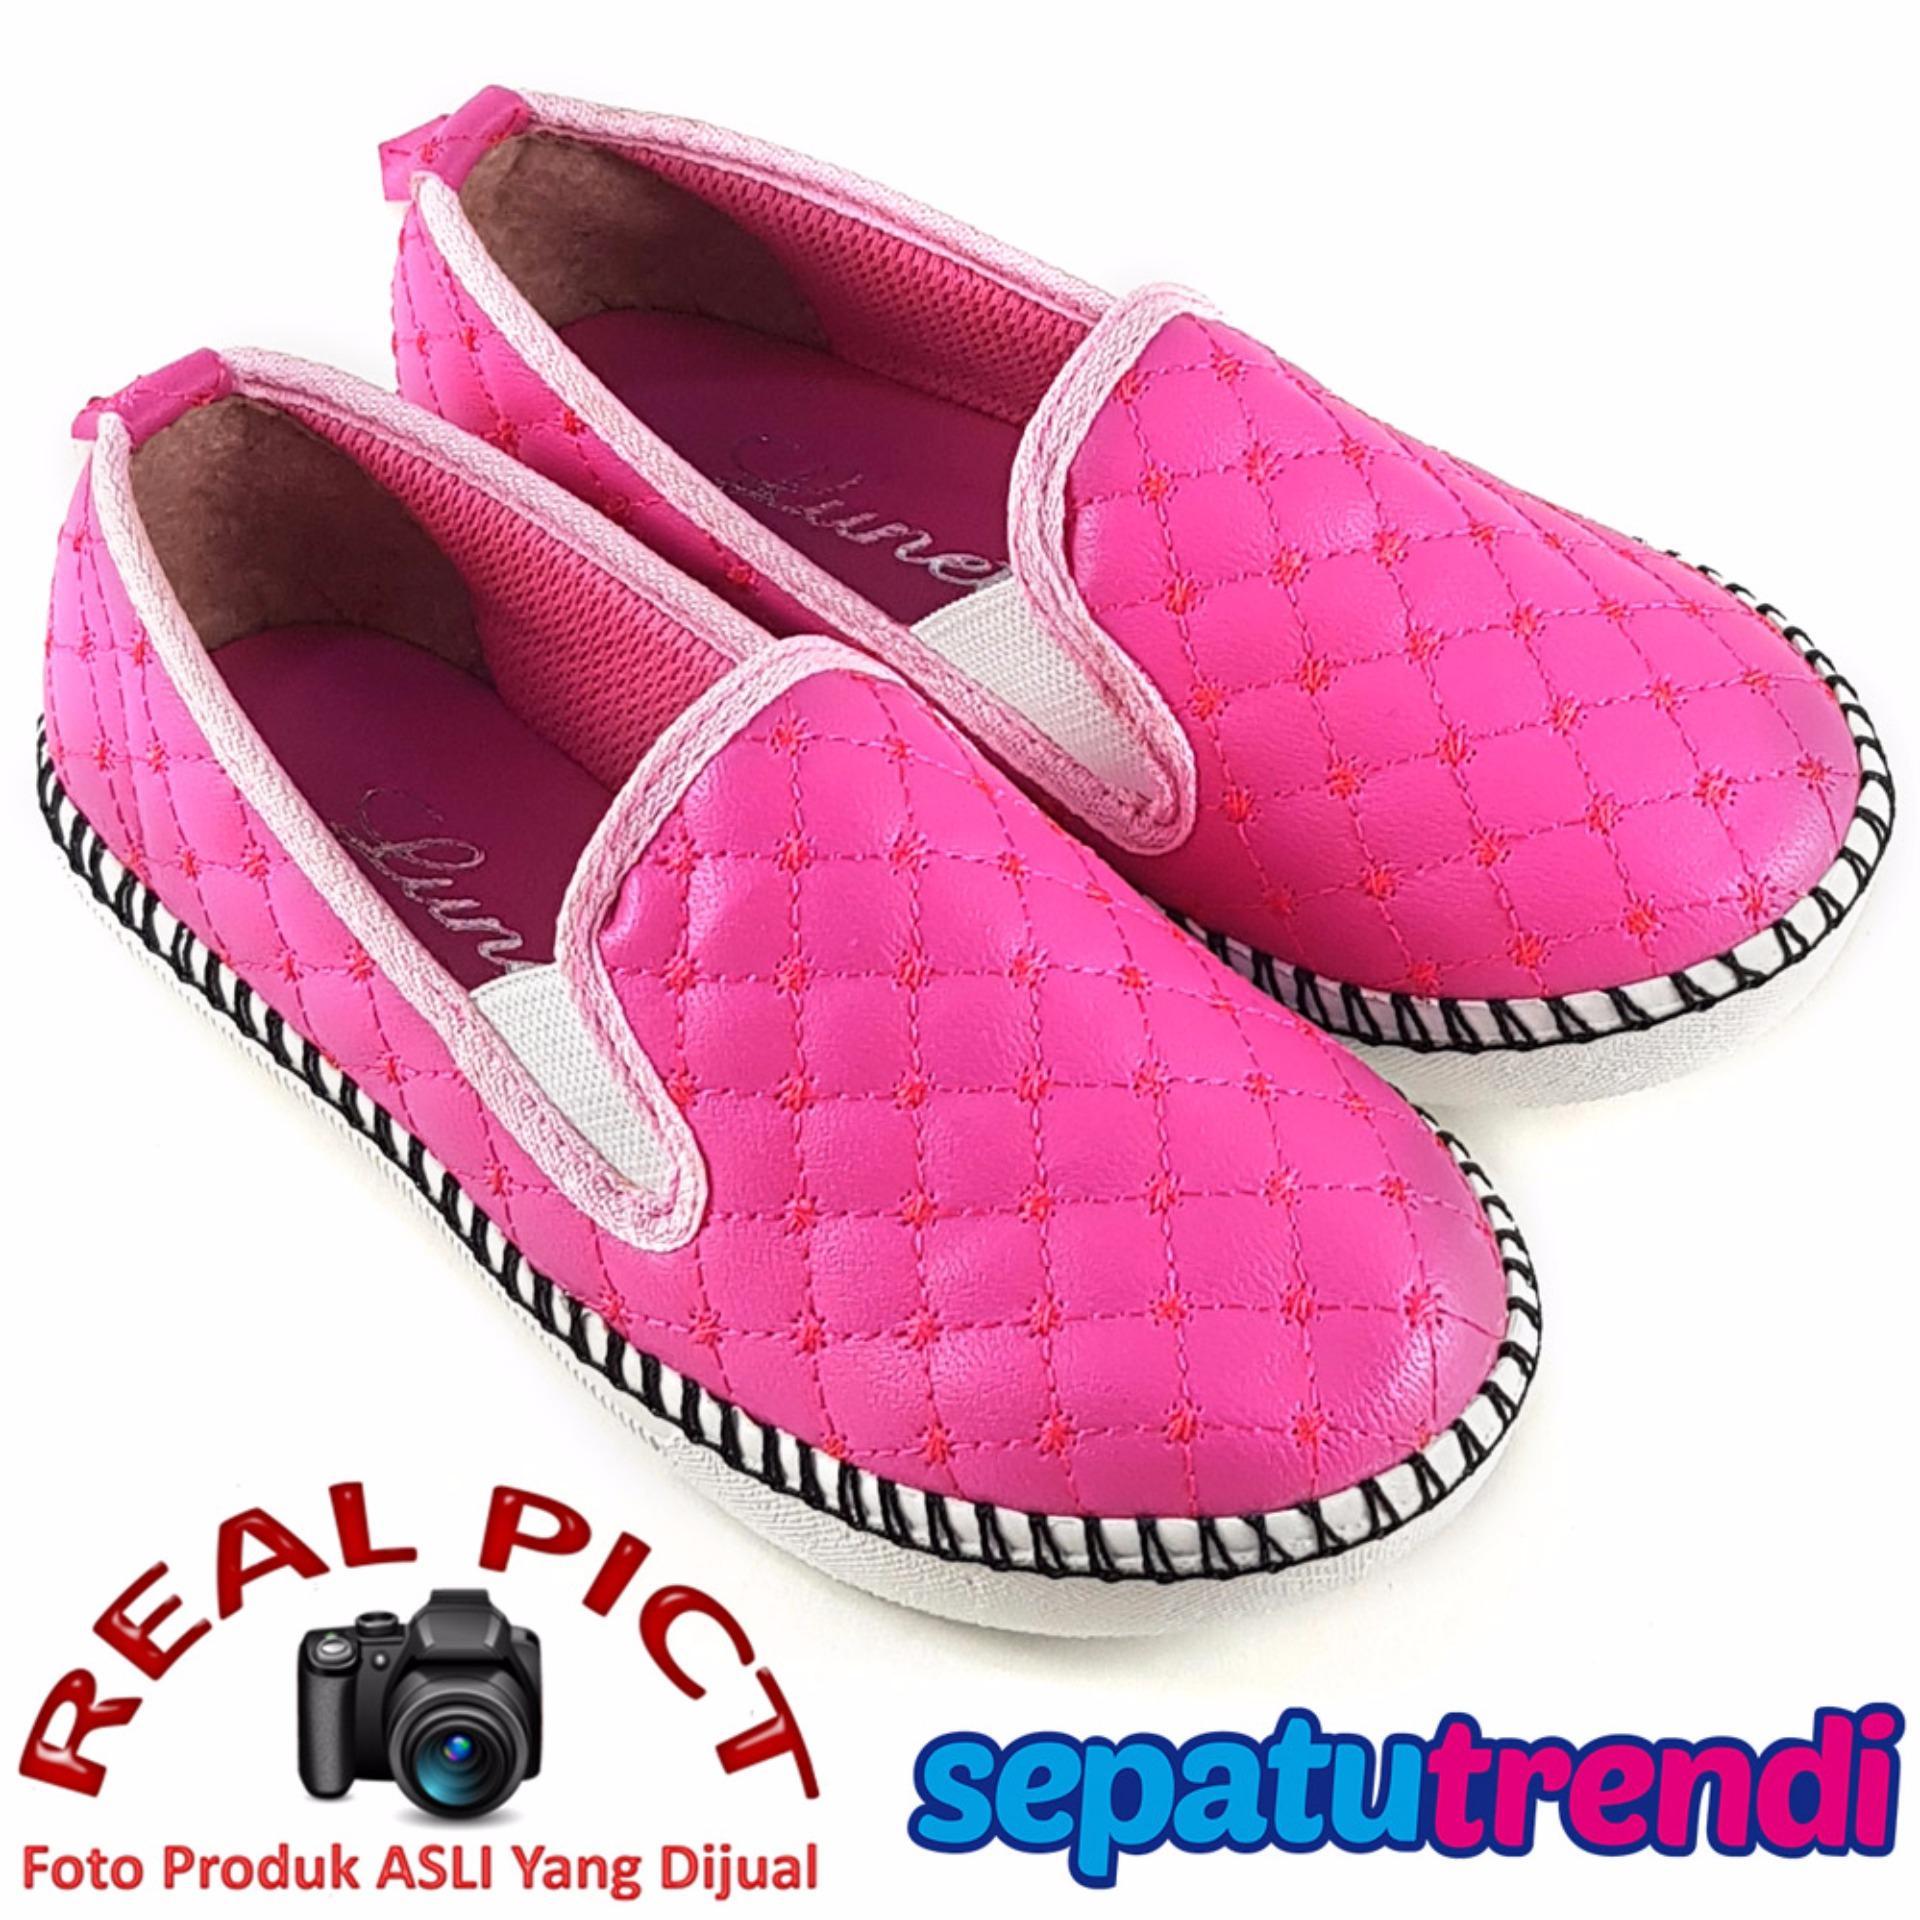 Harga Lunetta Sepatu Anak Perempuan Slip On Sol Rajut Rjag Fuchsia Lunetta Terbaik